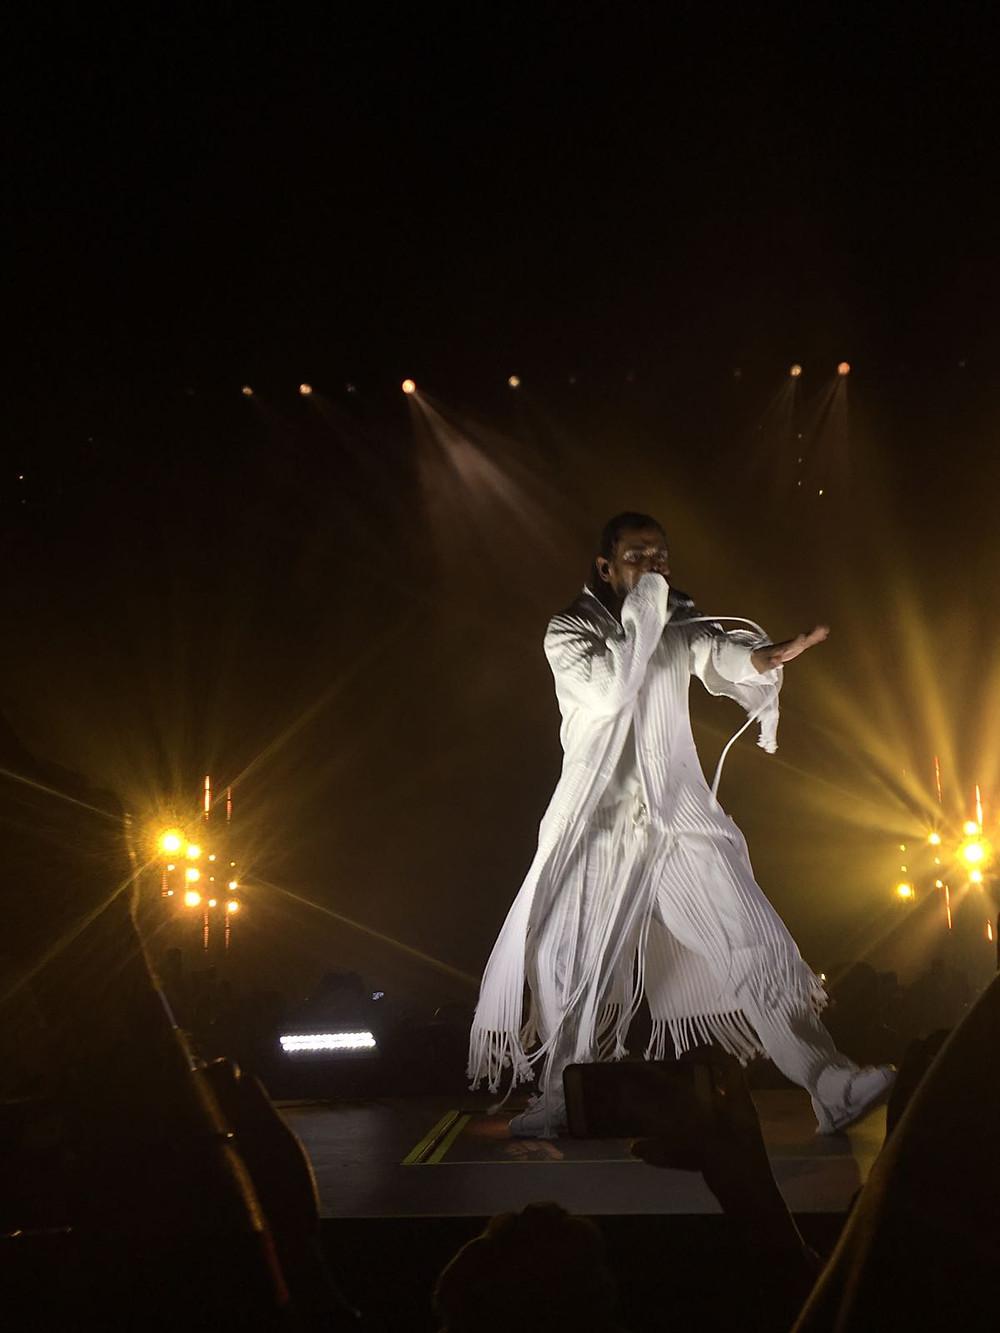 Man, Kendrick Lamar rapping at concert